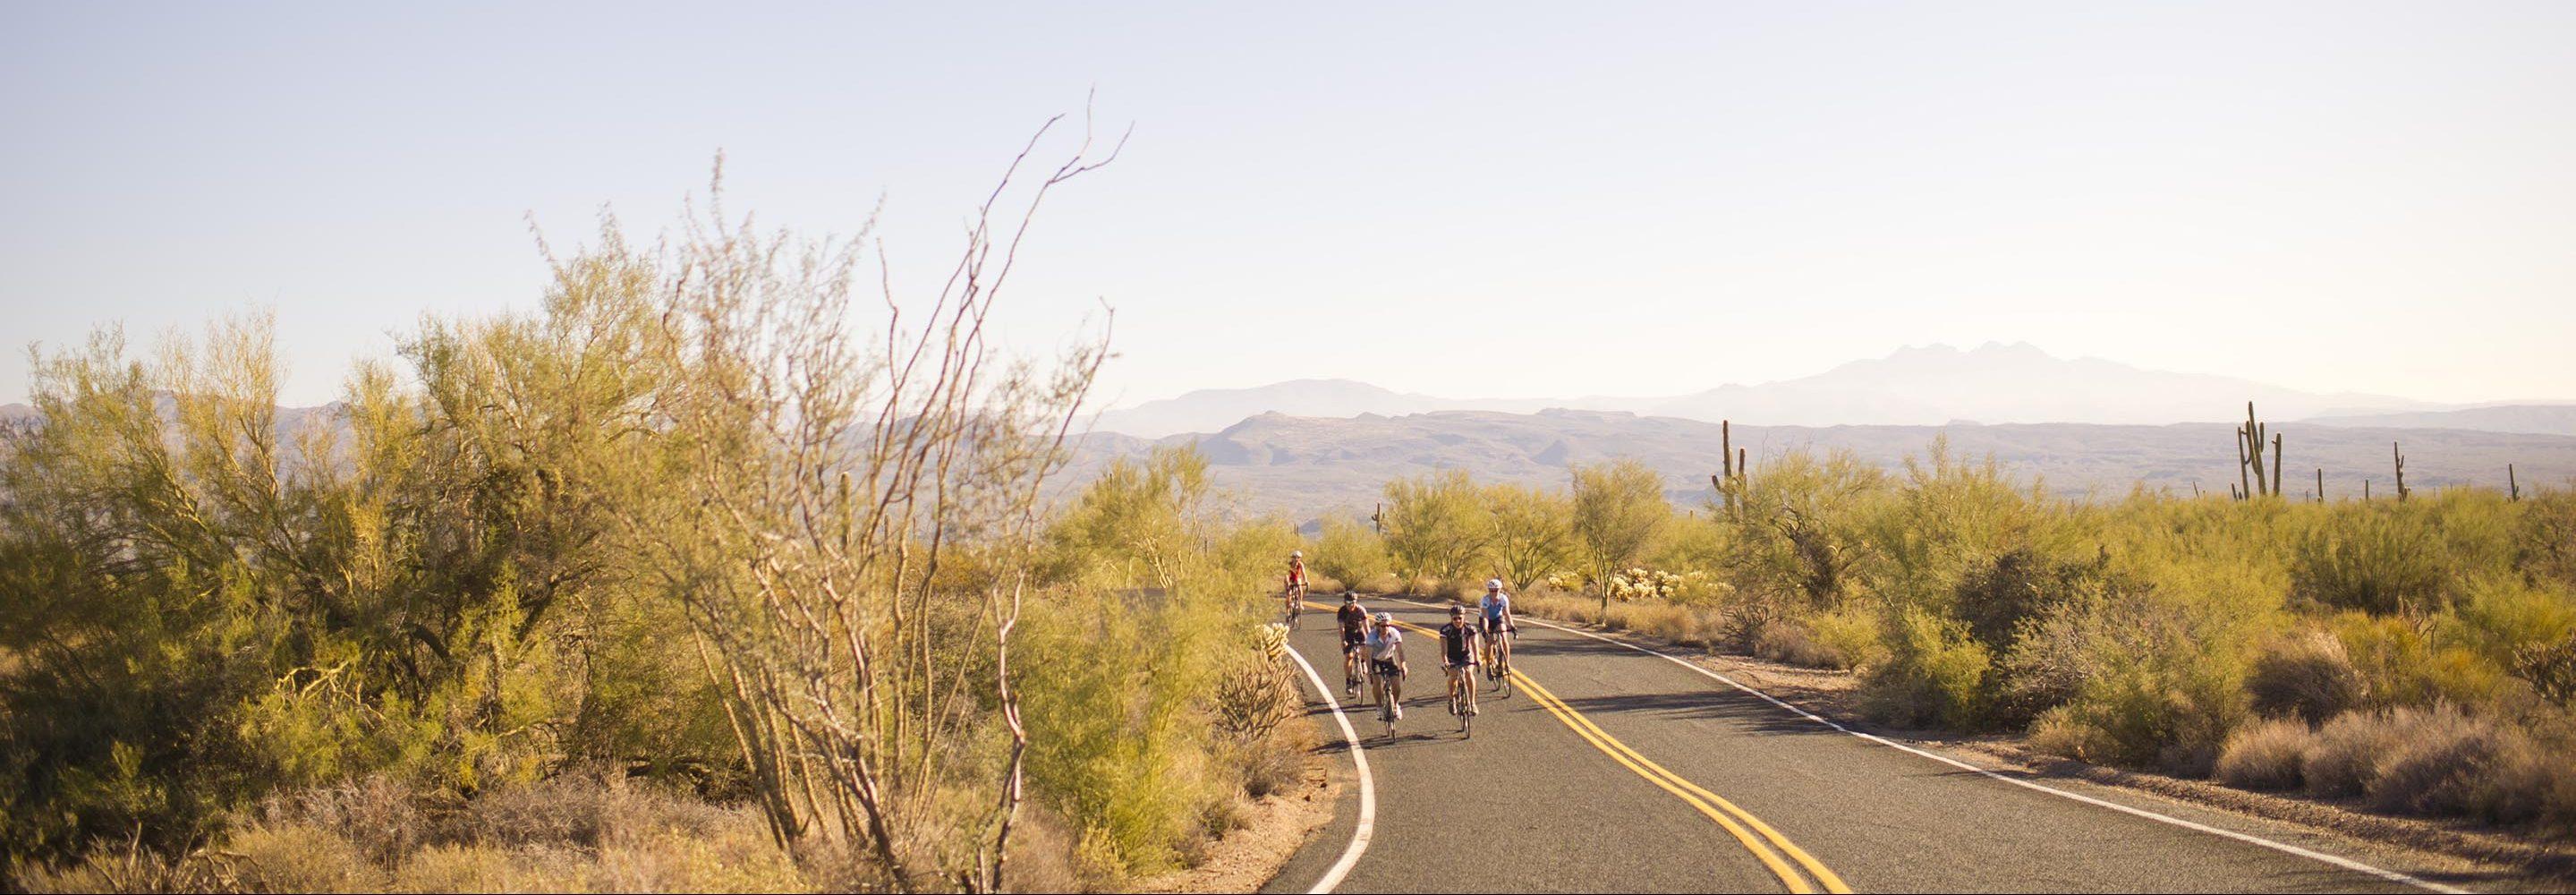 Cyclist on Sonoran Desert Road